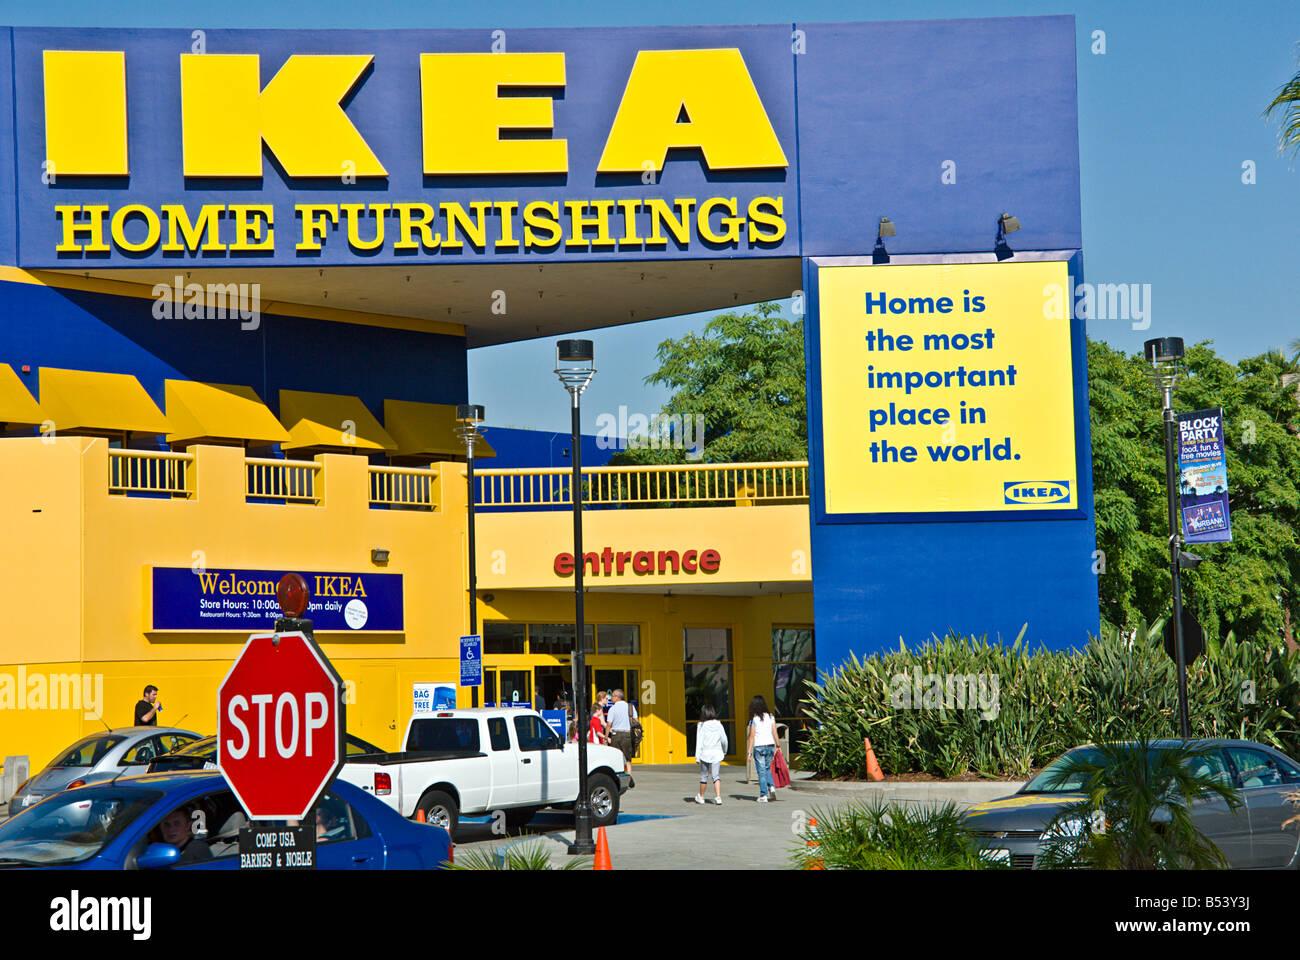 Ikea chairs immagini ikea chairs fotos stock alamy